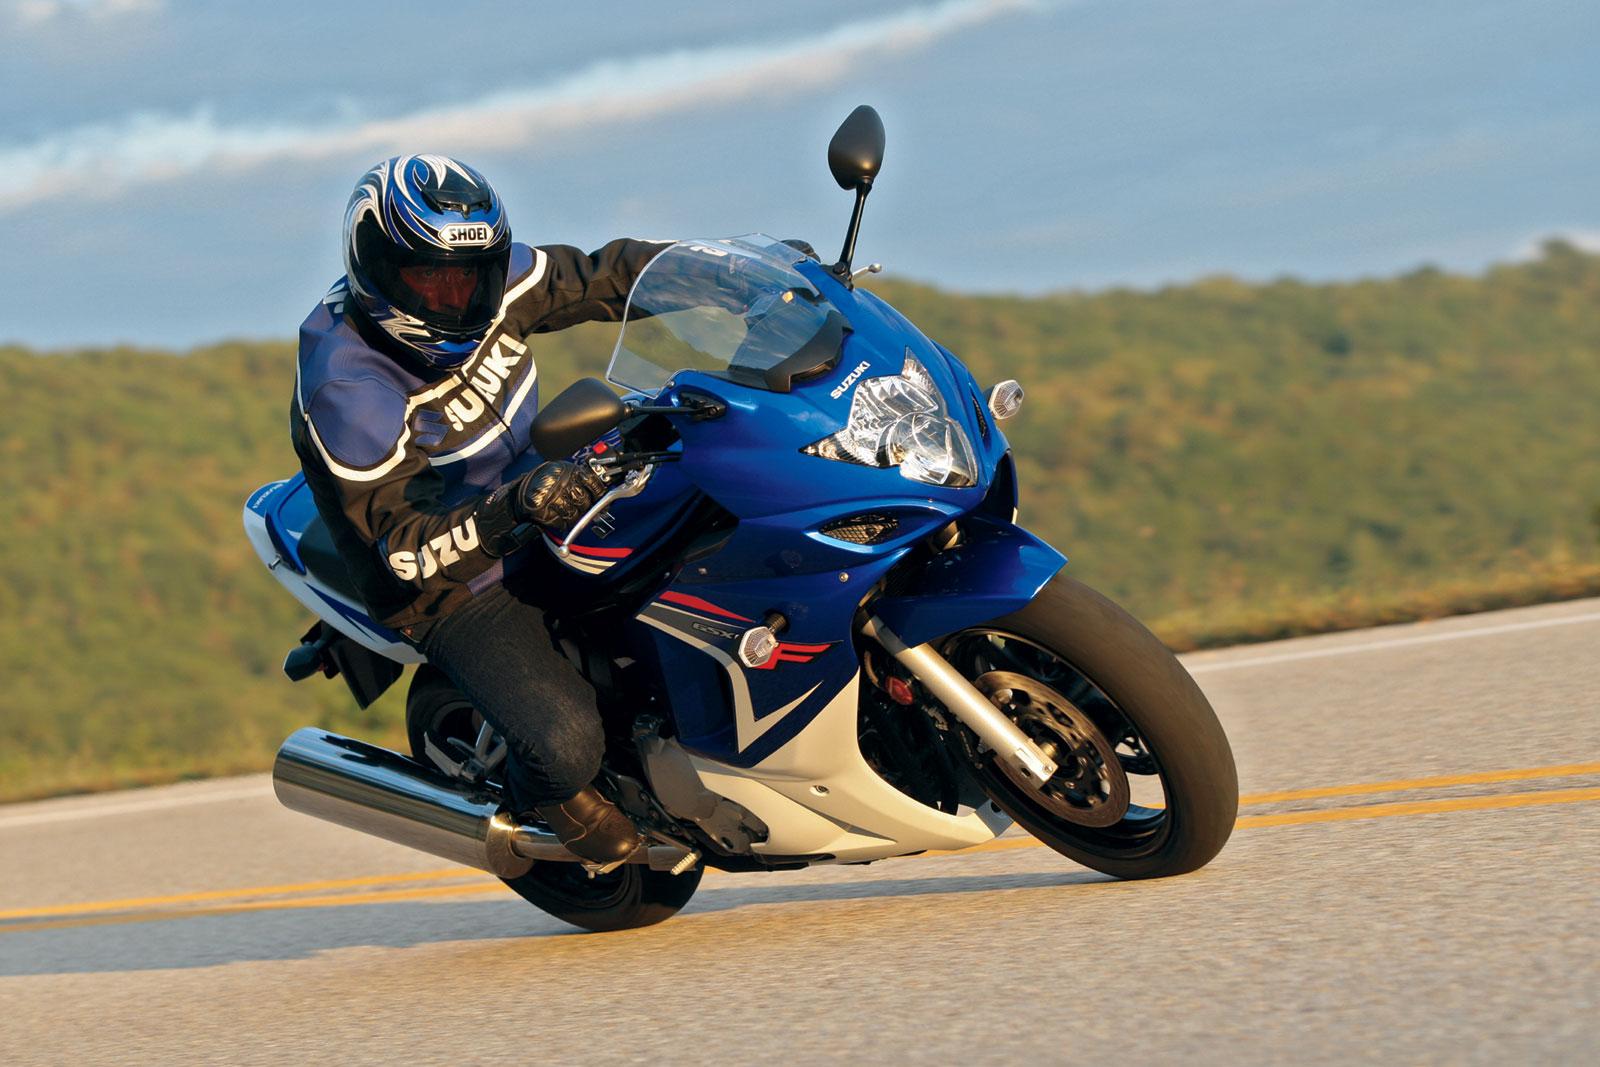 Тест-драйв мотоцикла Suzuki GSX650F